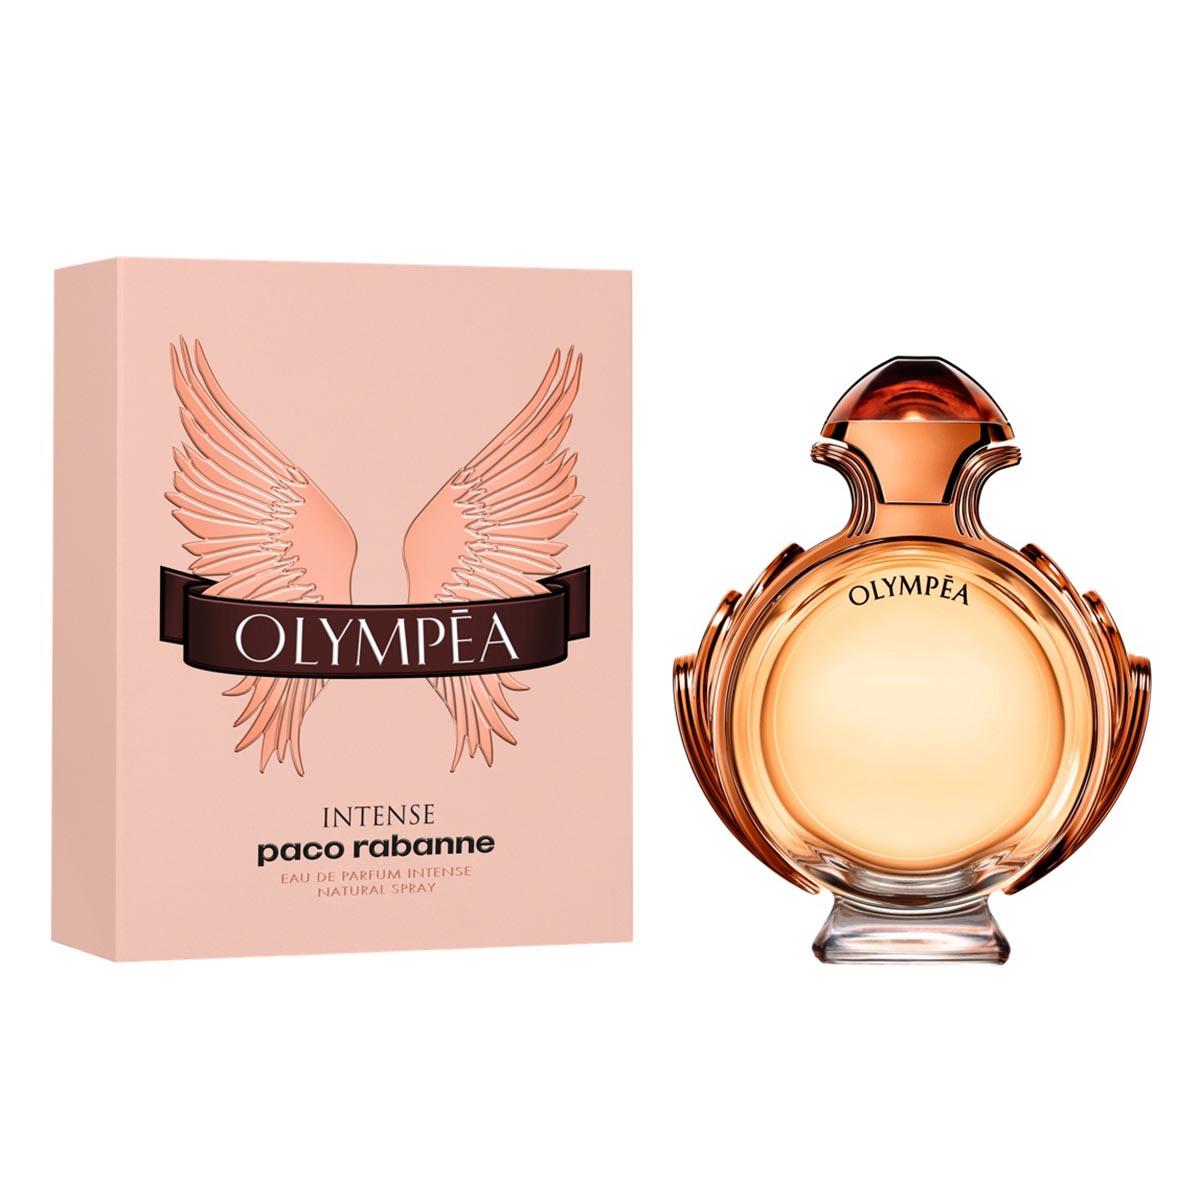 Paco rabanne olympea intense eau de parfum 30ml vaporizador